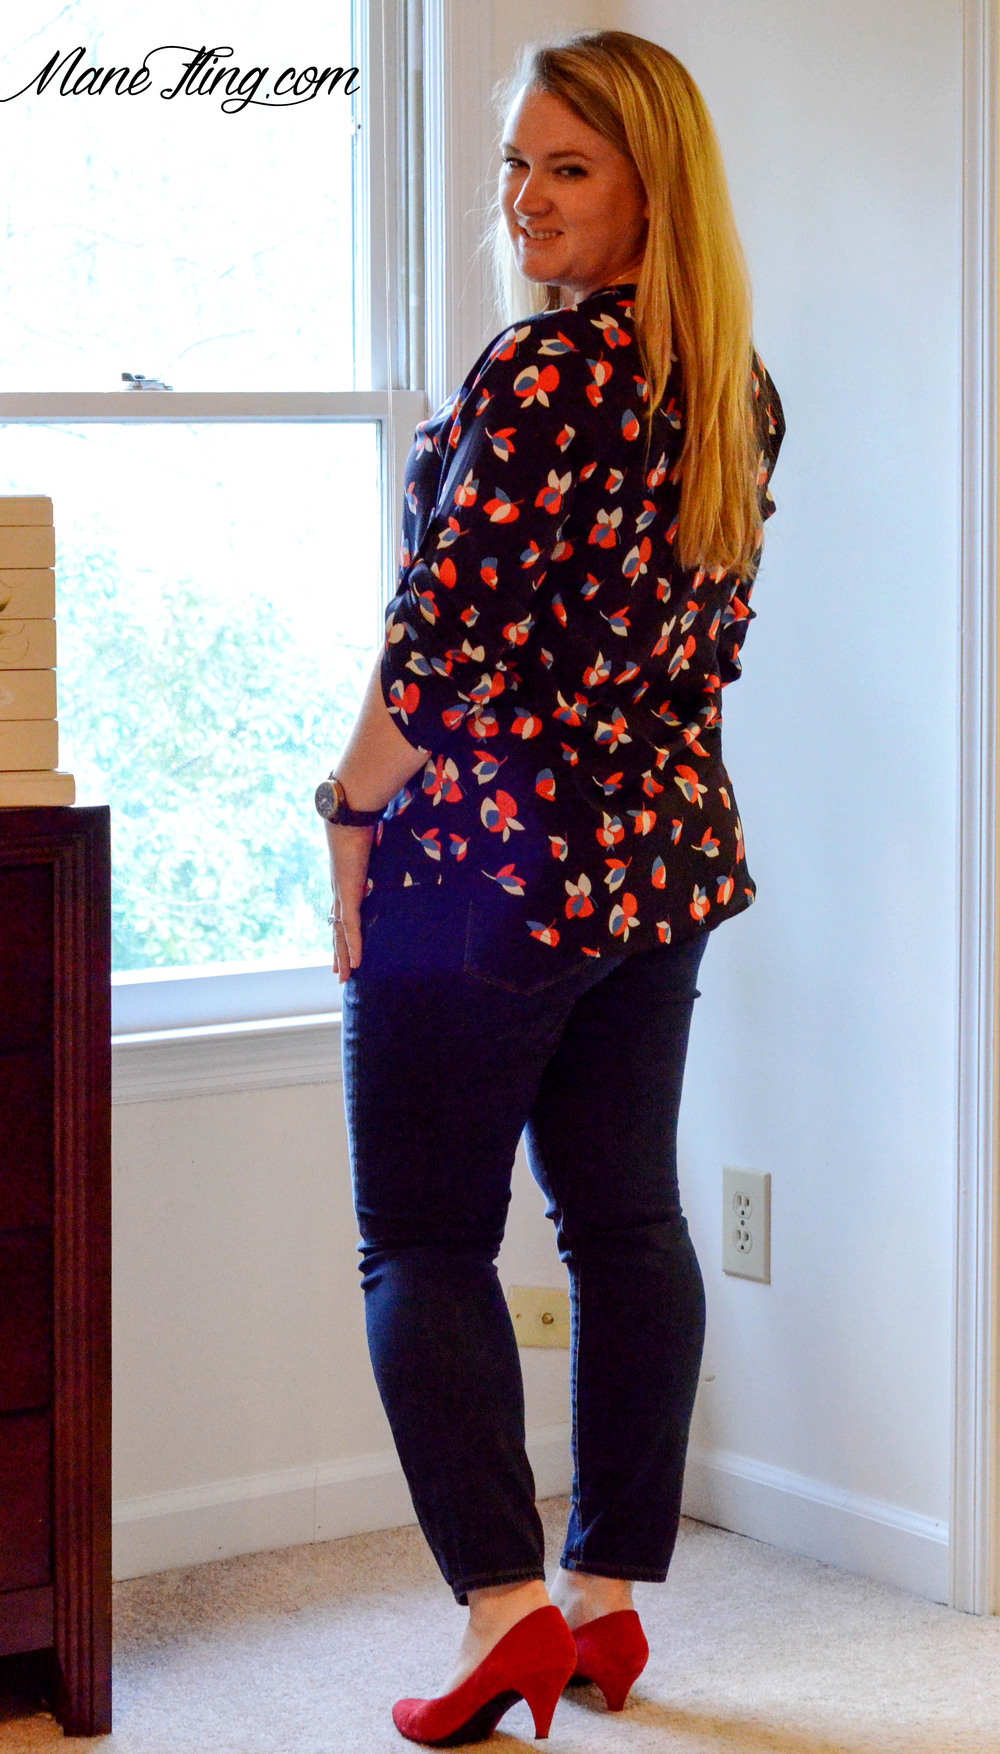 Patterned shirt back stitch fix.jpg